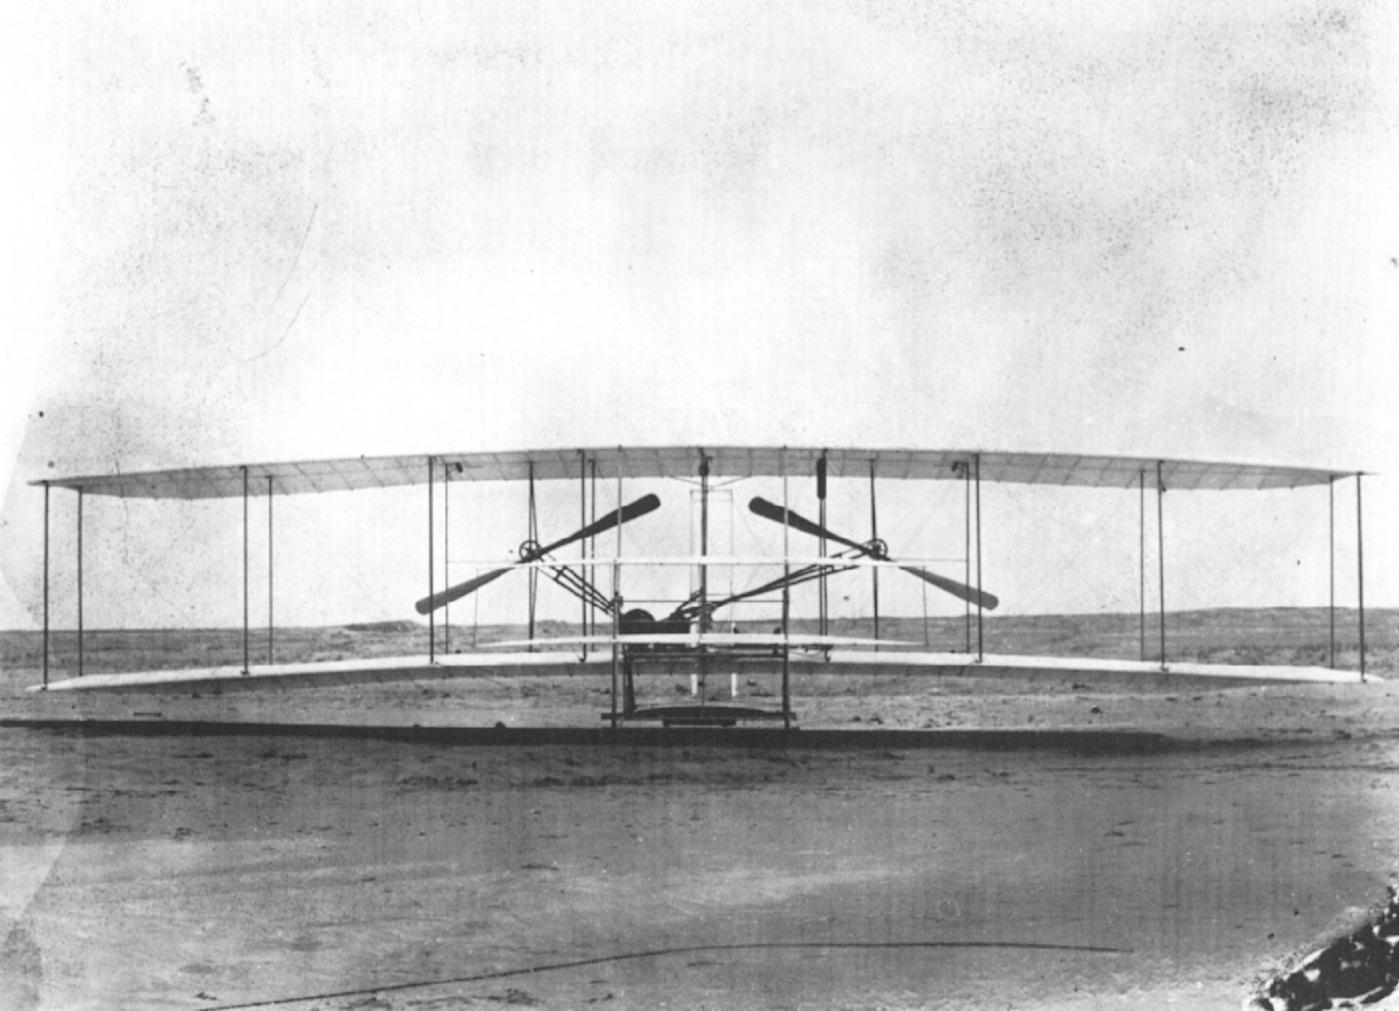 Wright Photos